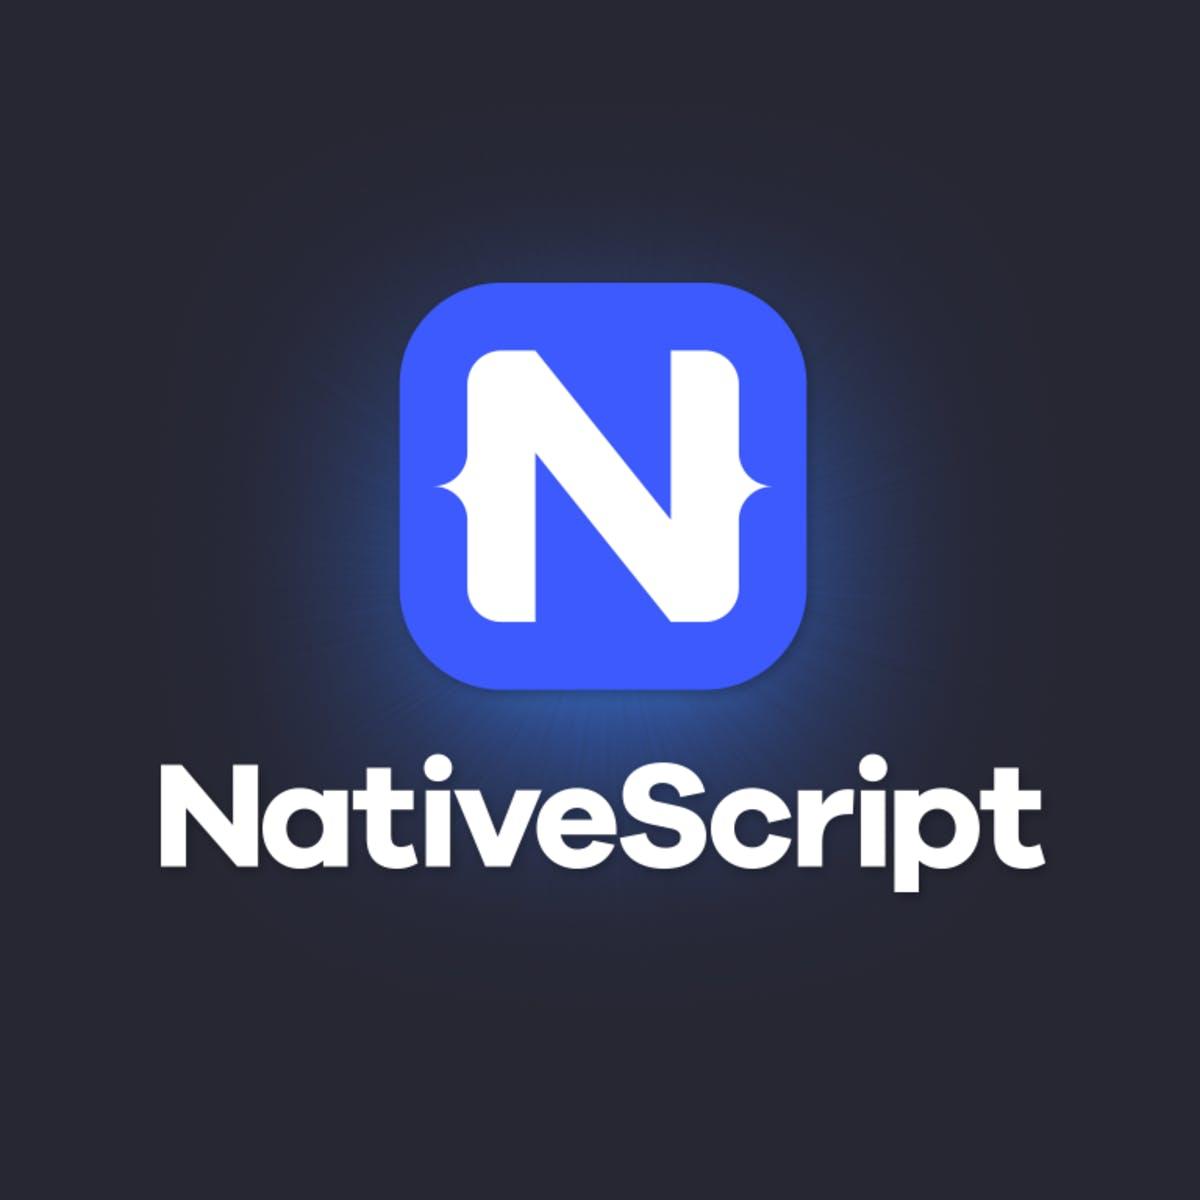 Native Script Development